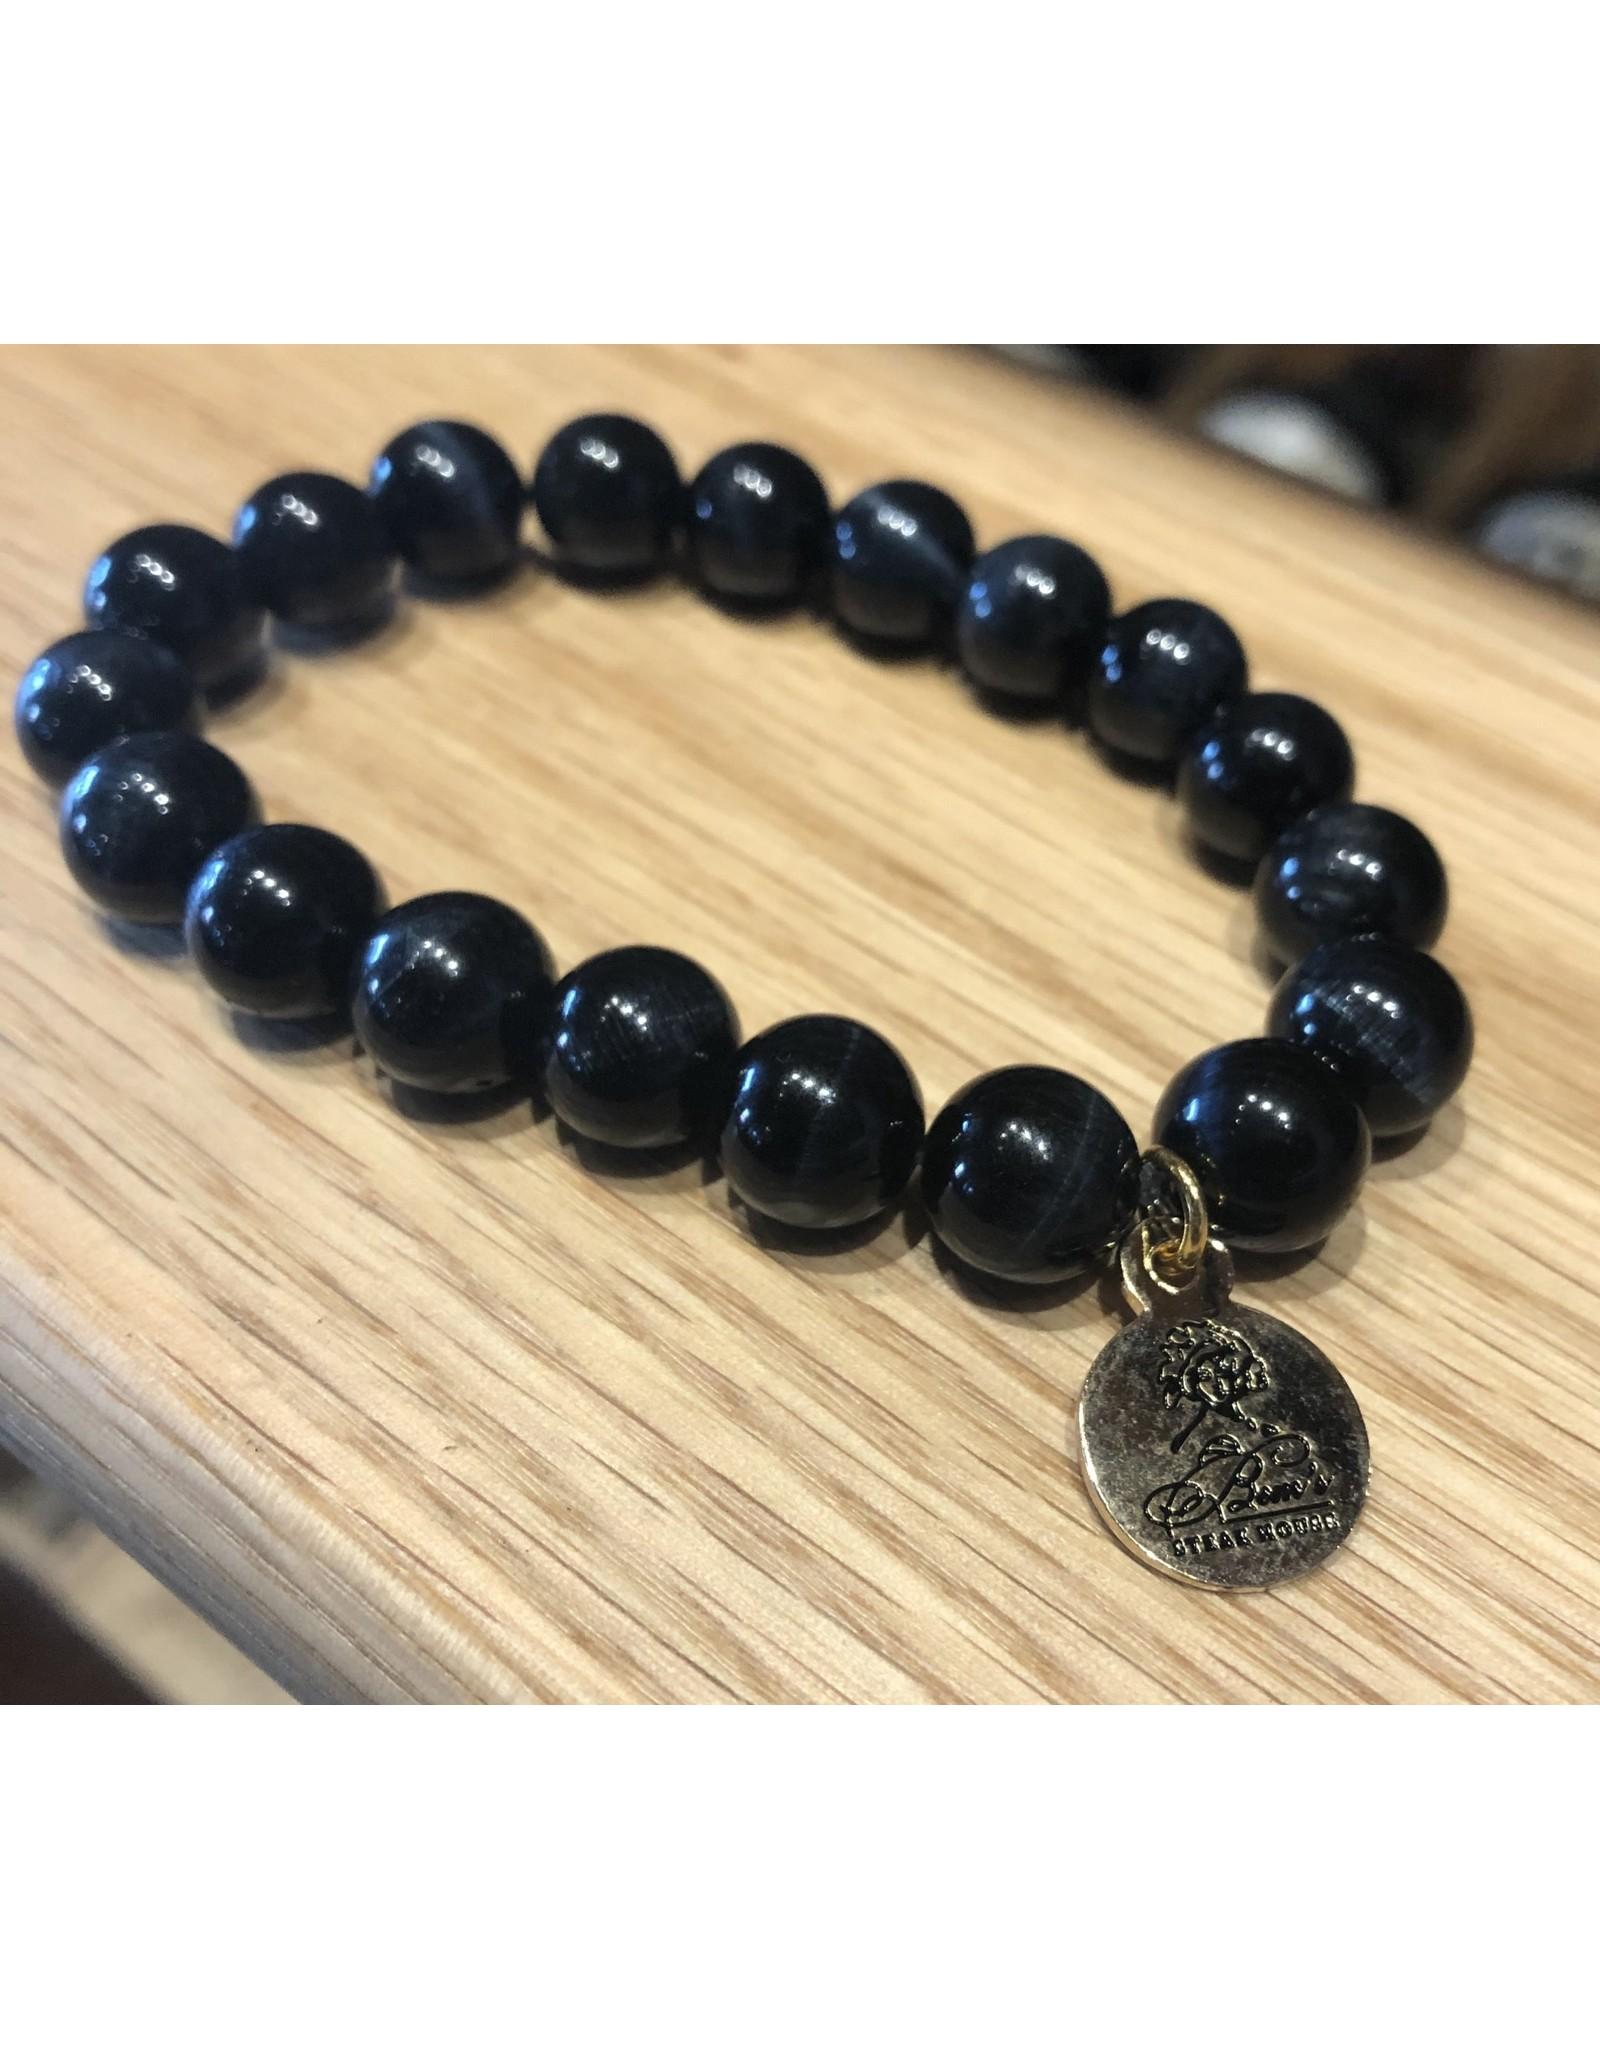 Bourbon and Bowties Black Pearl Bracelet